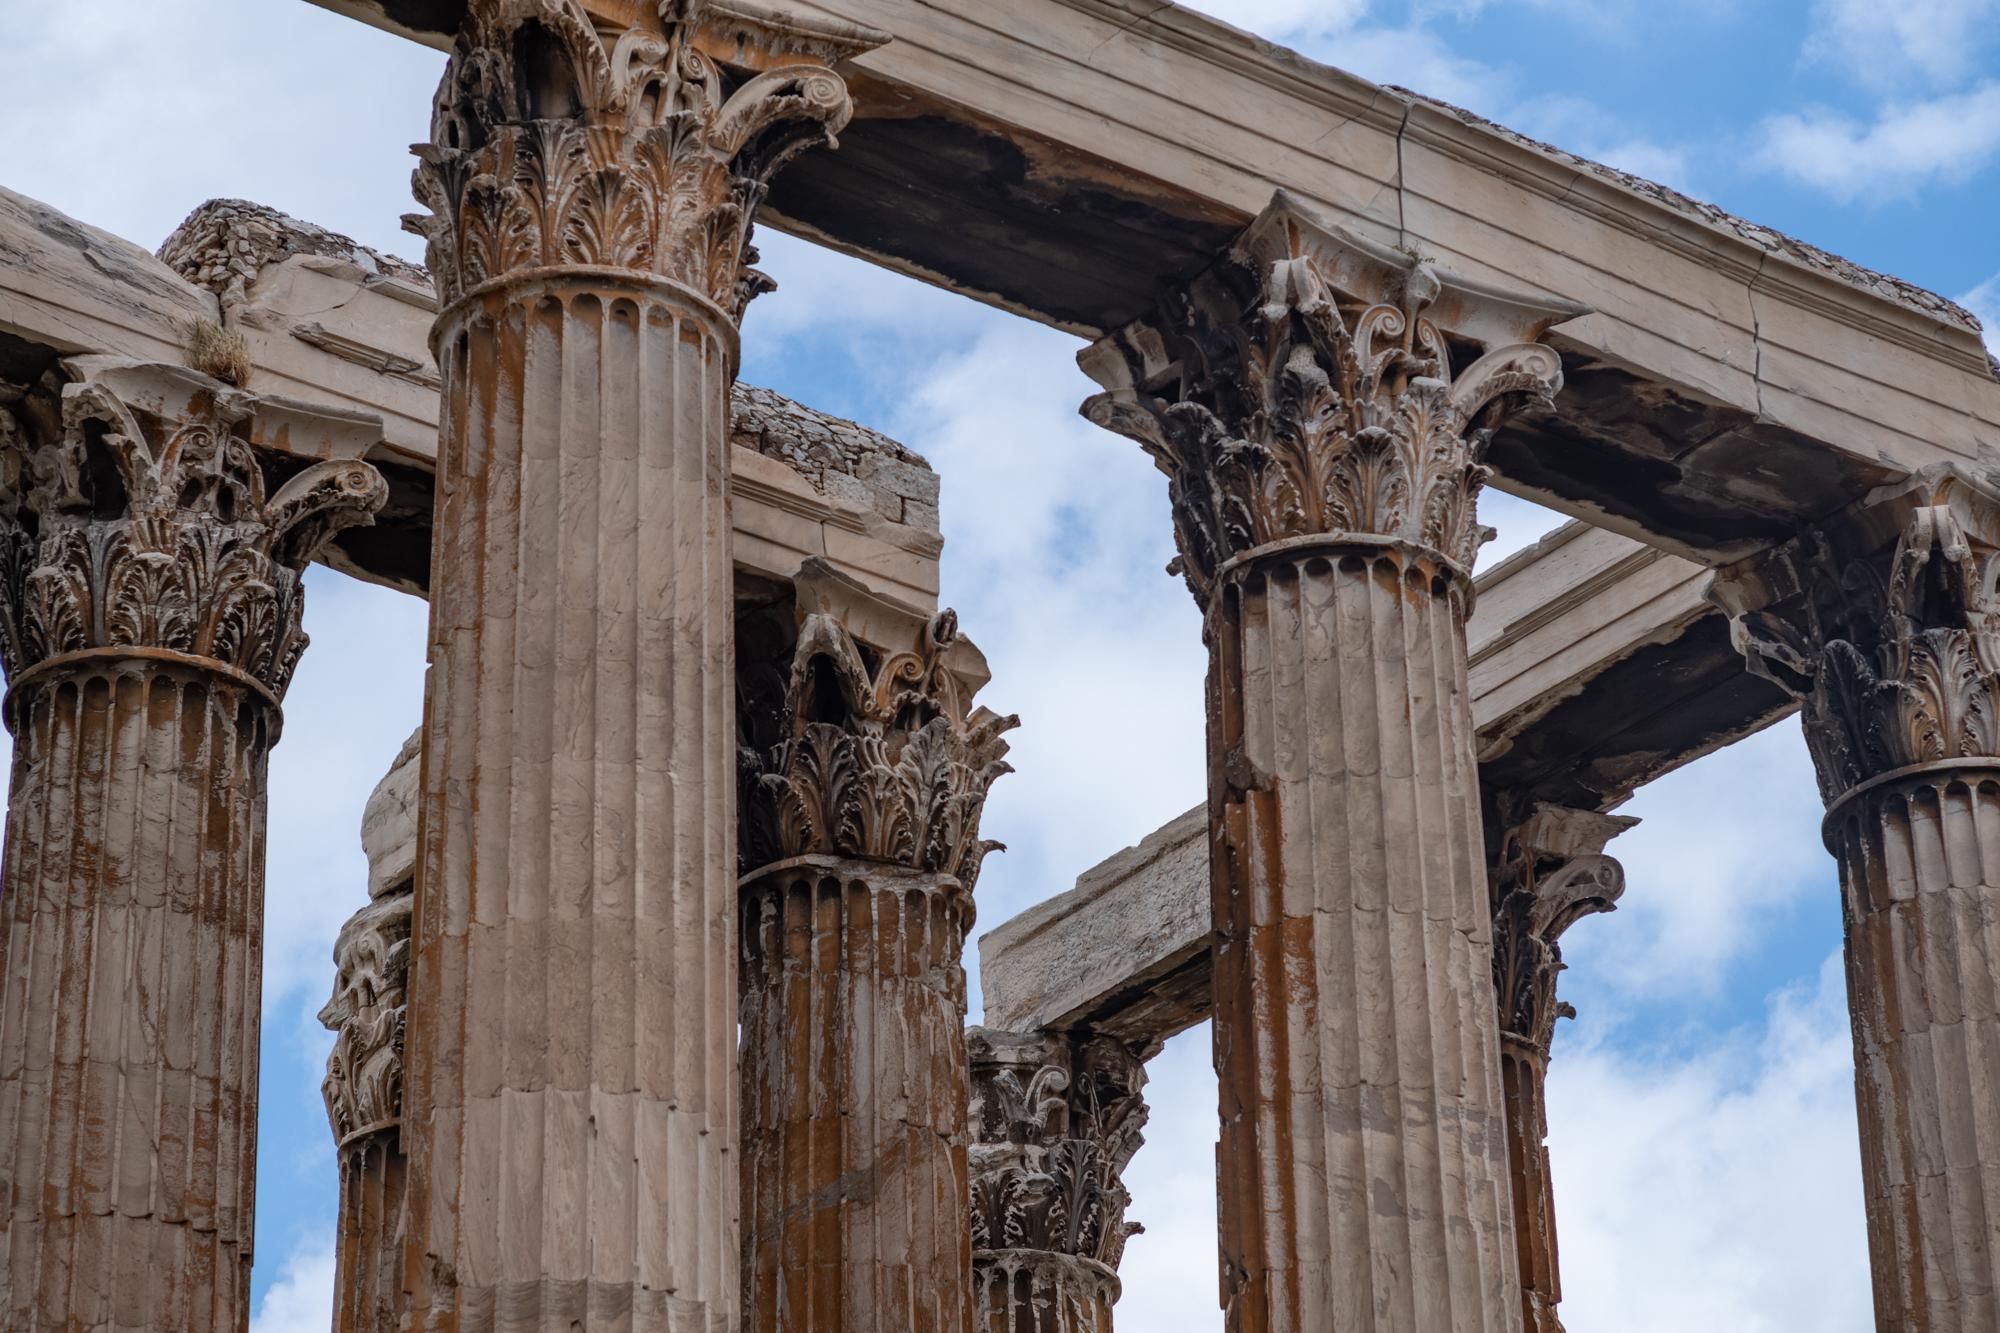 The corinthian columns of the Temple of Zeus